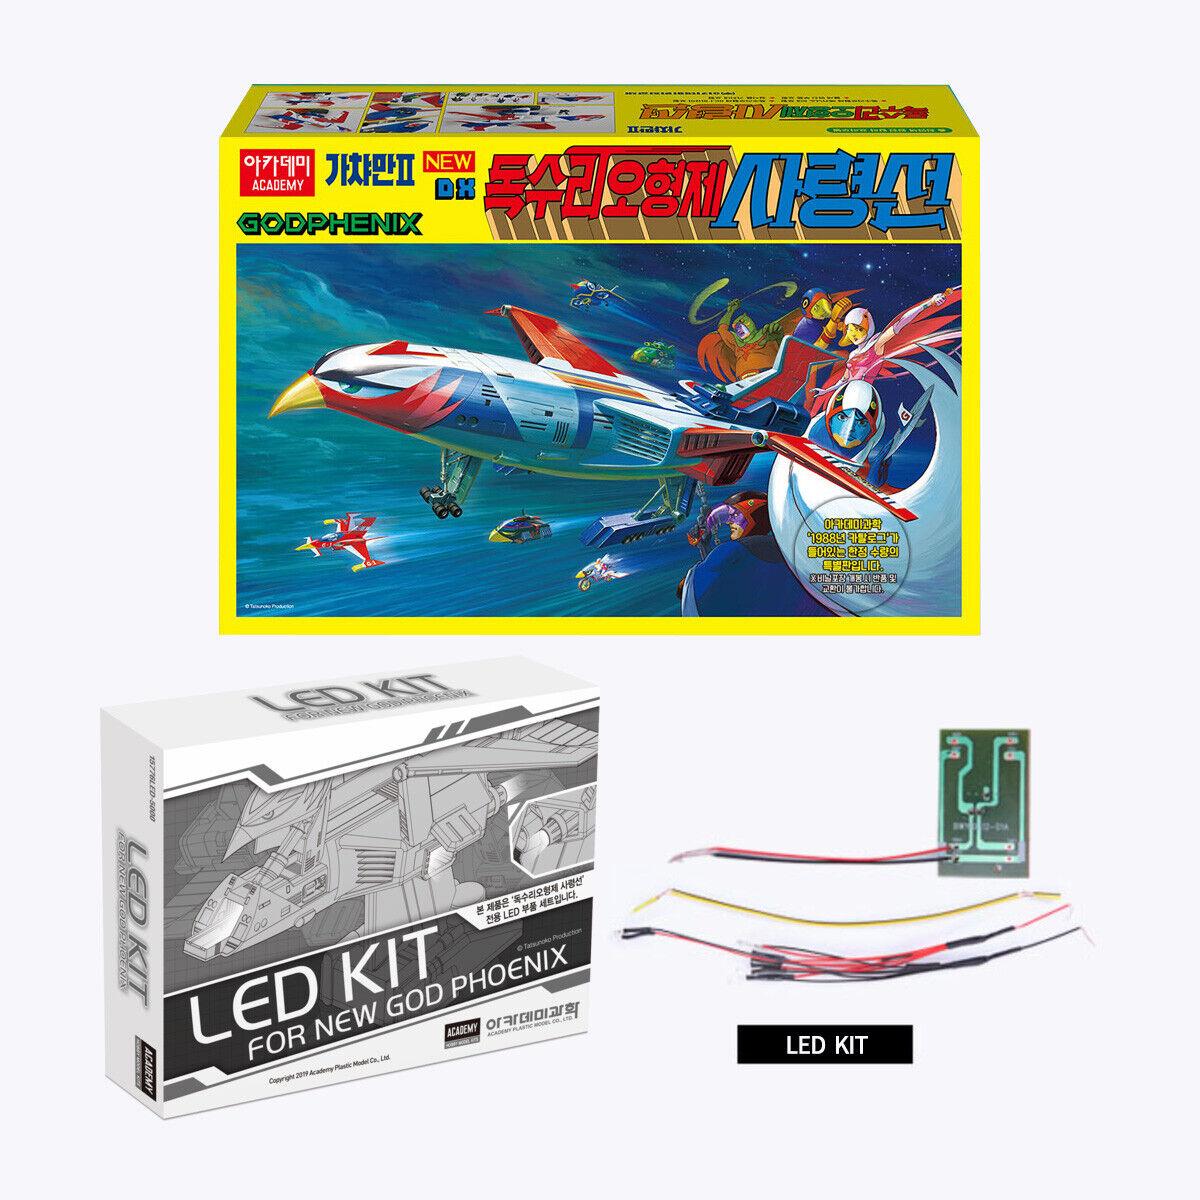 15776 Science Ninja Team Gatchaman 2 New GodPhenix With LED Kit